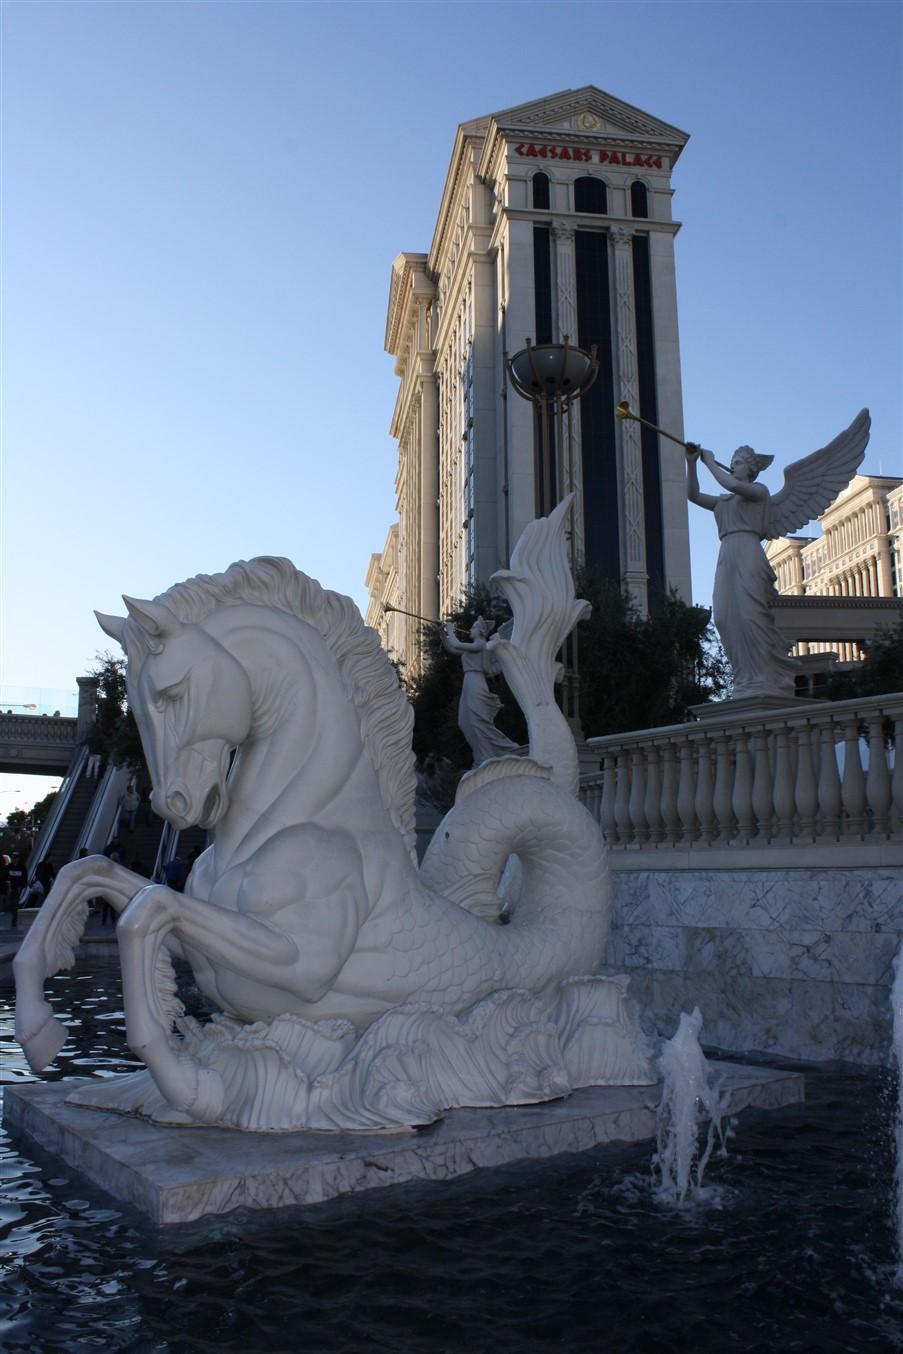 2011 12 04 Las Vegas 45.jpg